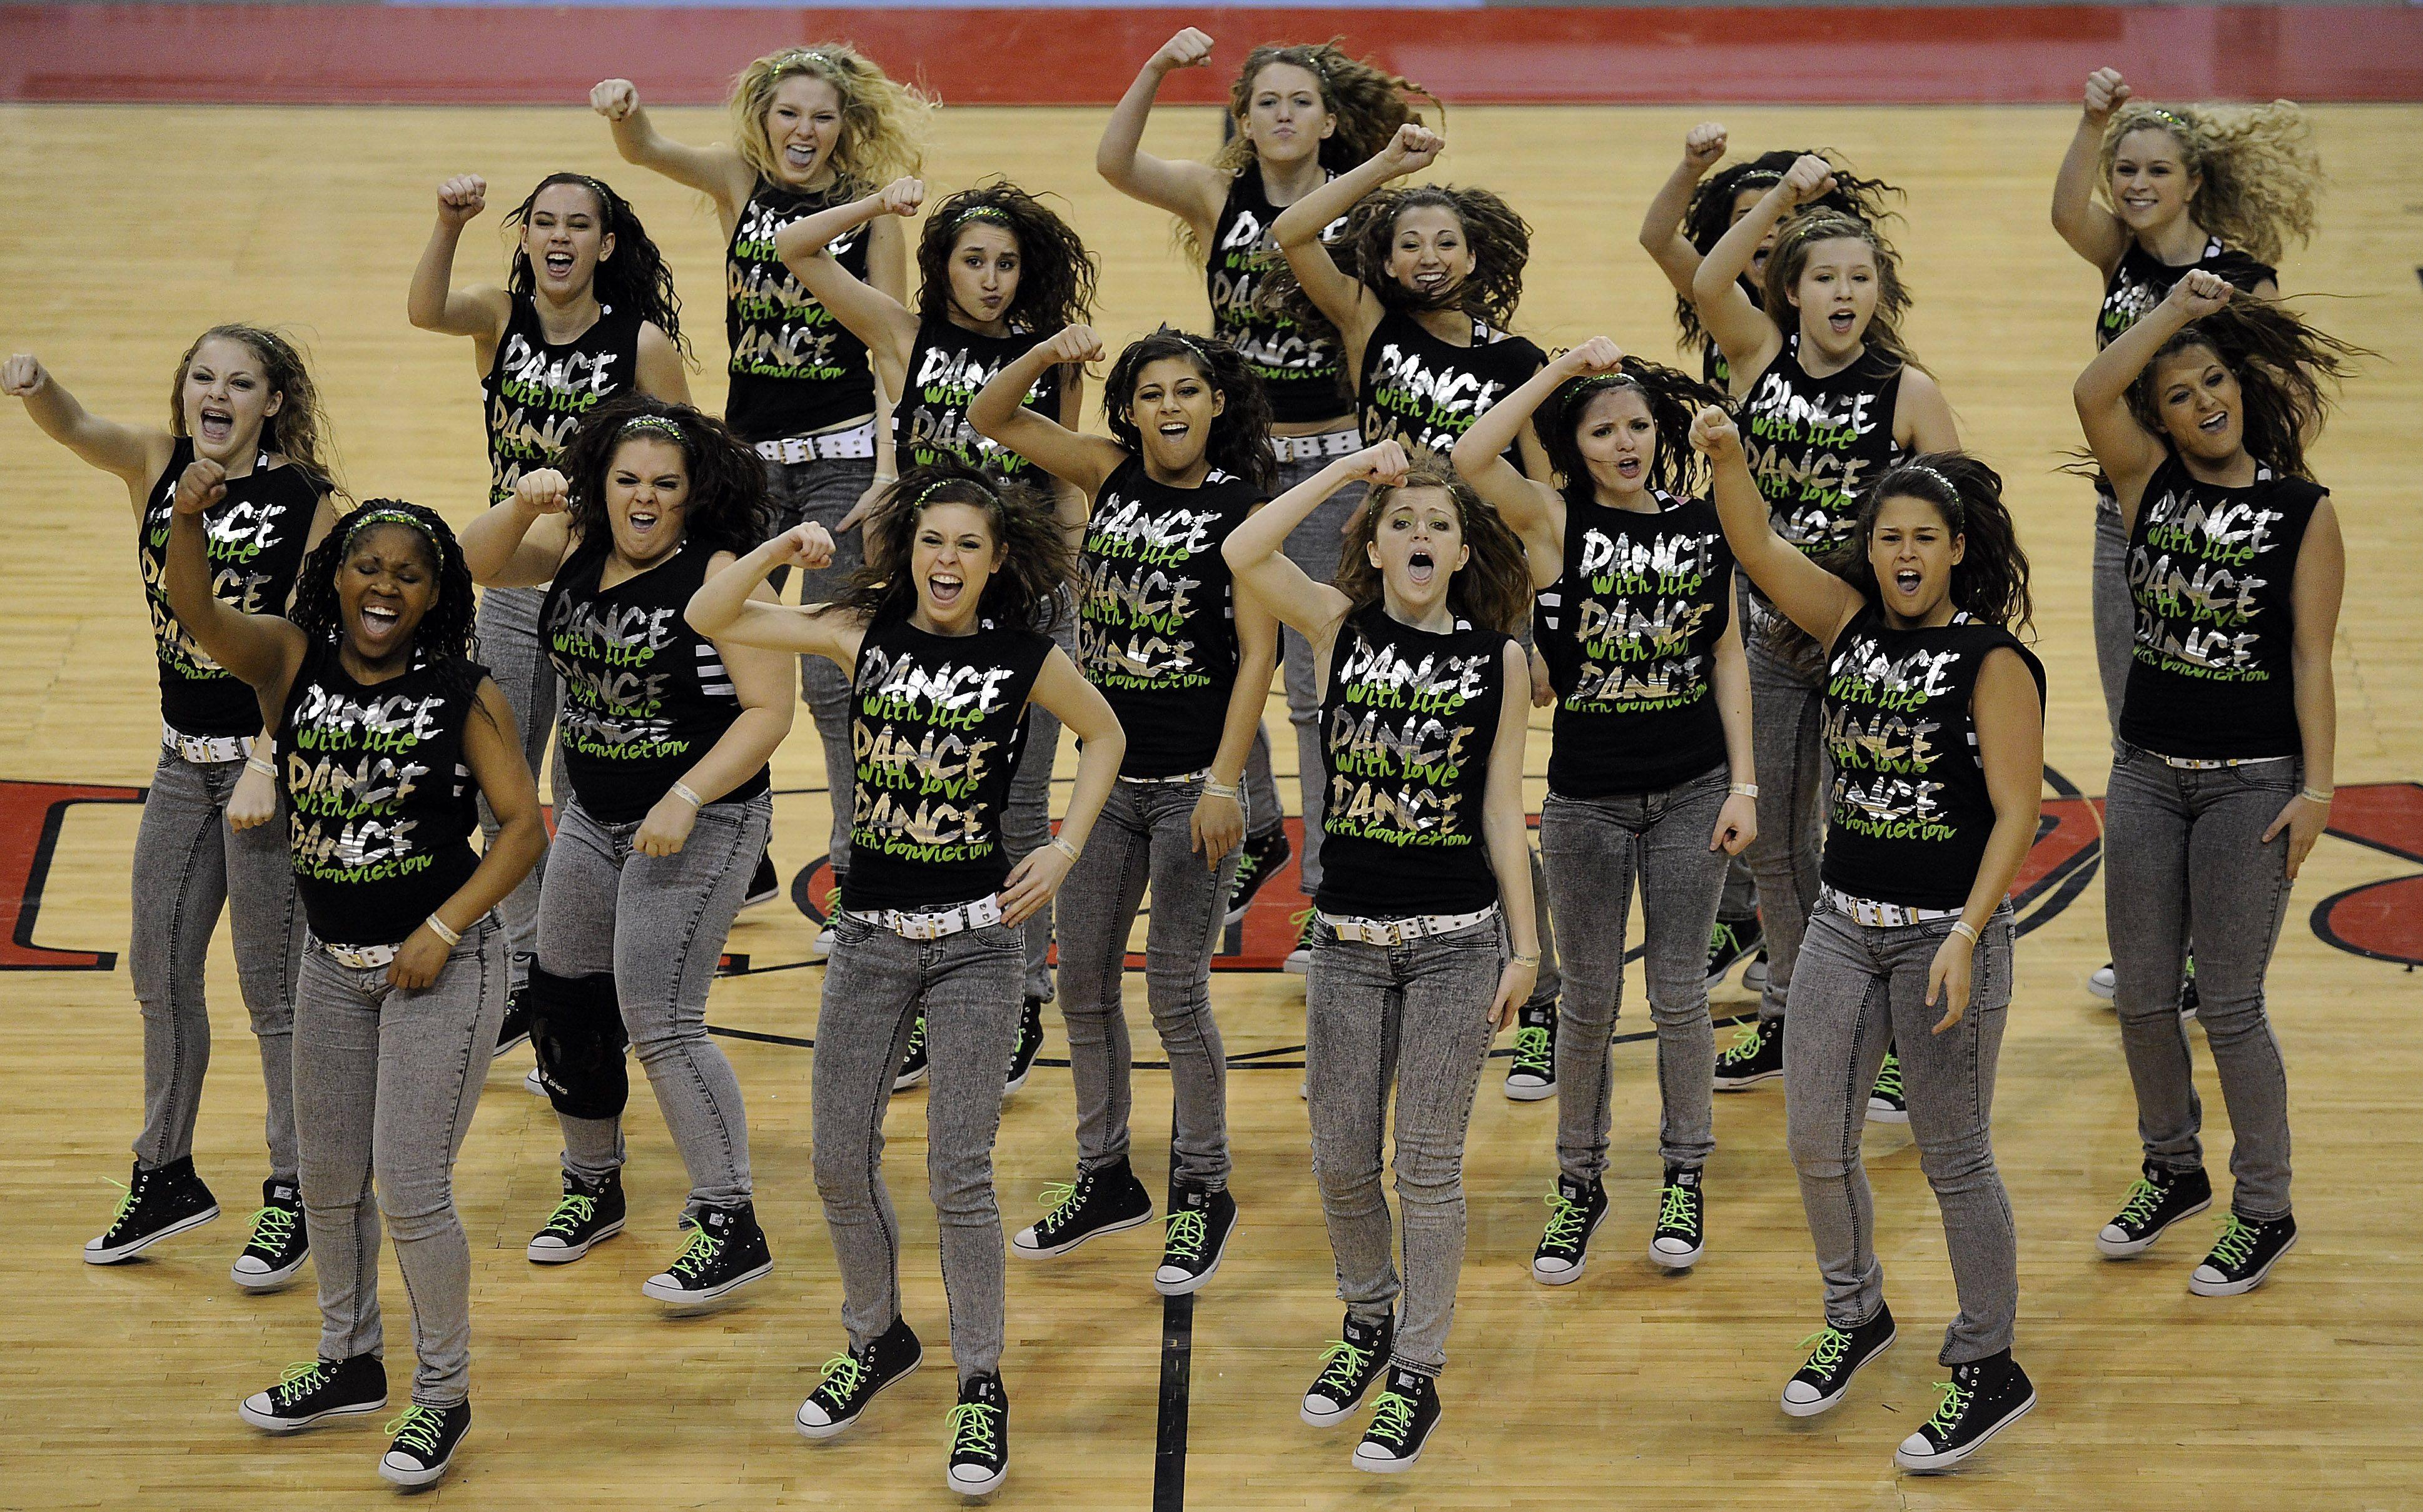 Suburban poms teams dance, kick their way to the top